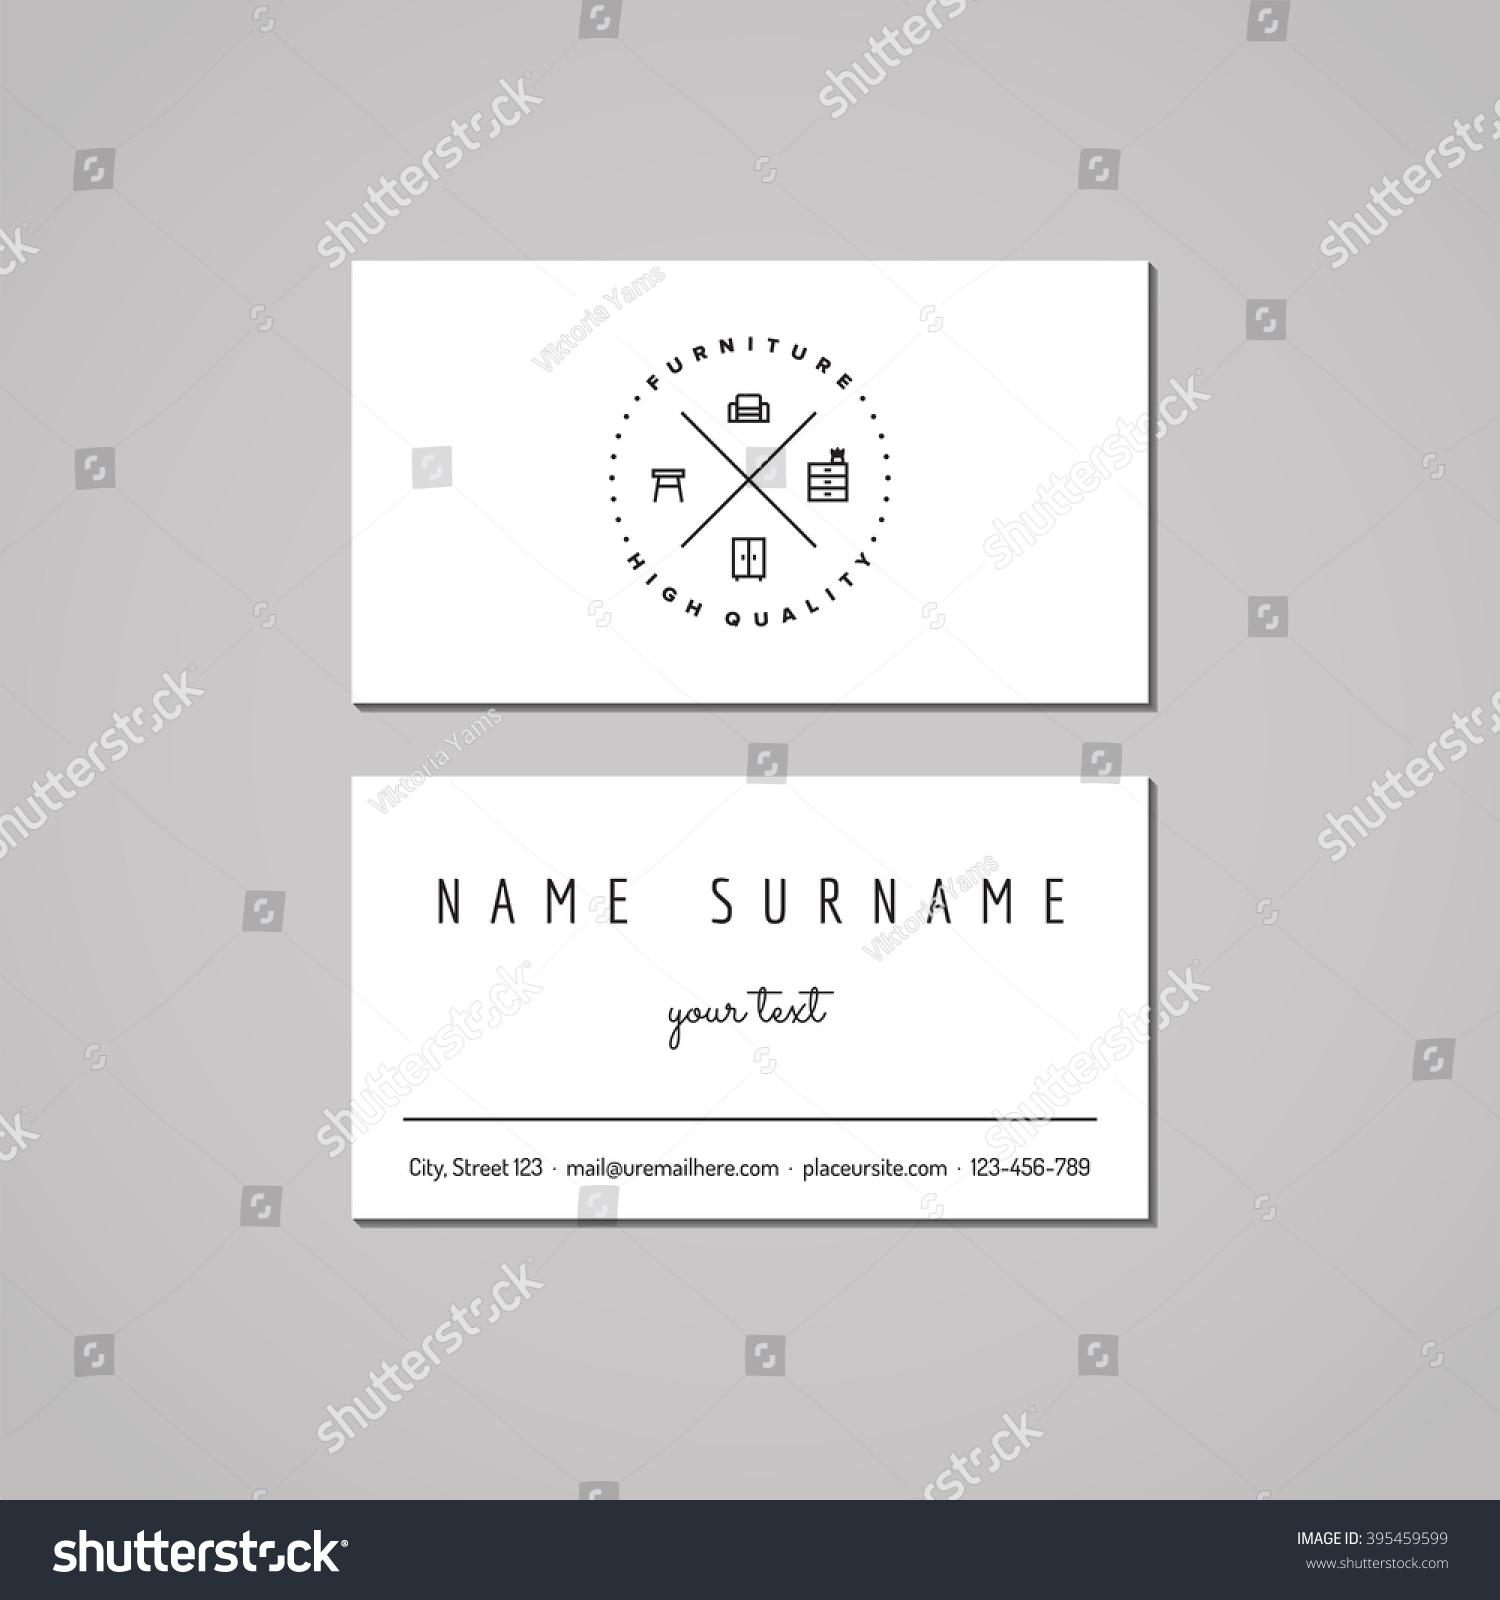 Furniture Business Card Design Concept Furniture Stock Vector ...